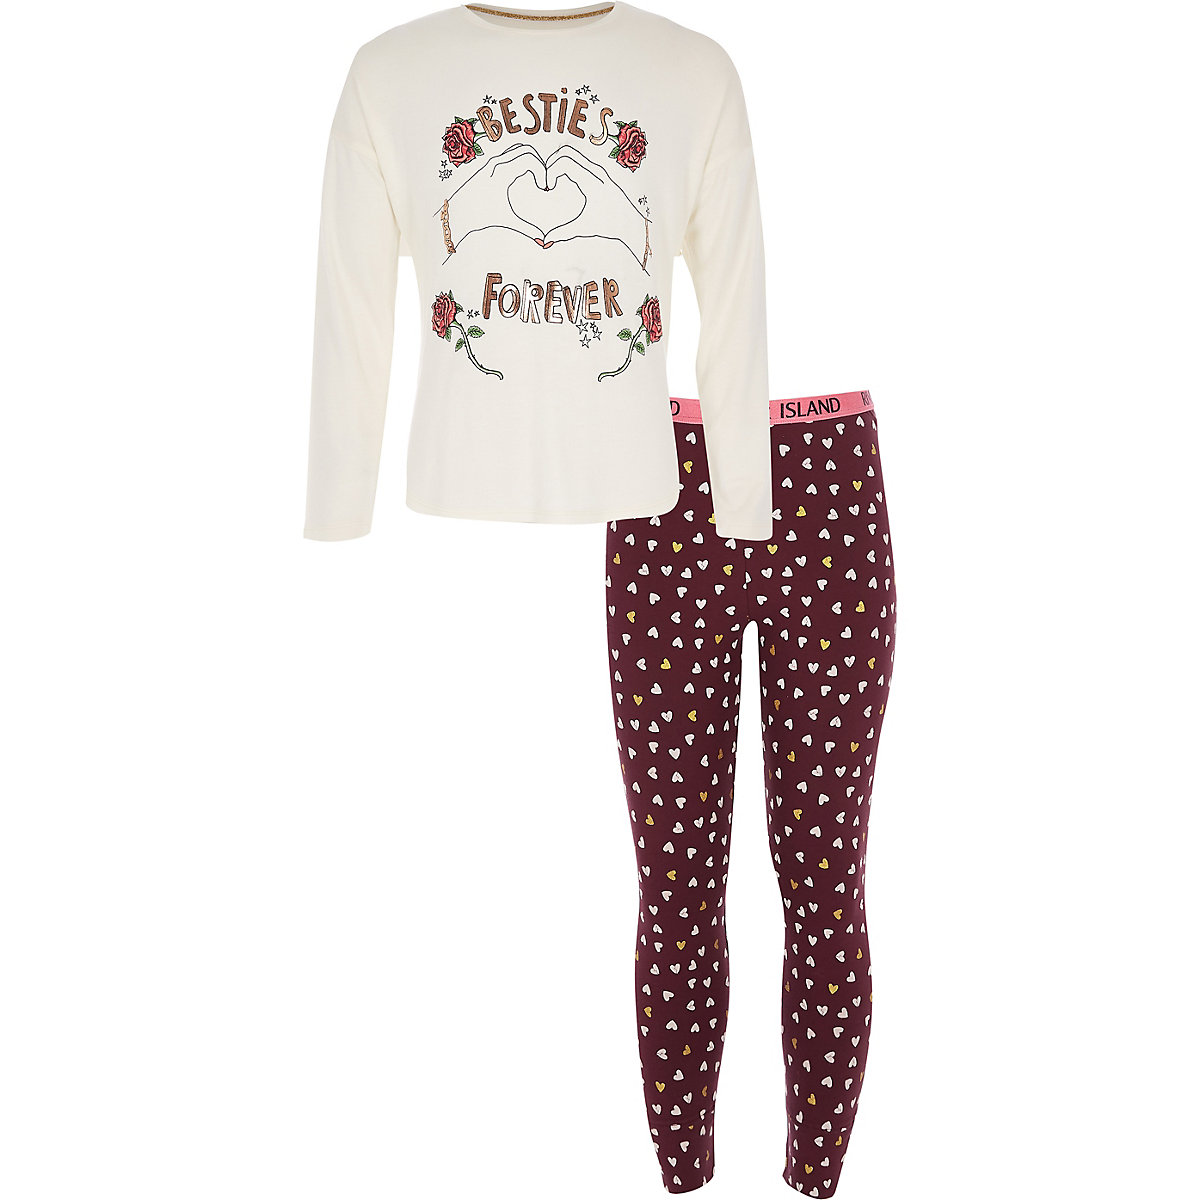 Girls red 'Besties forever' pajama set